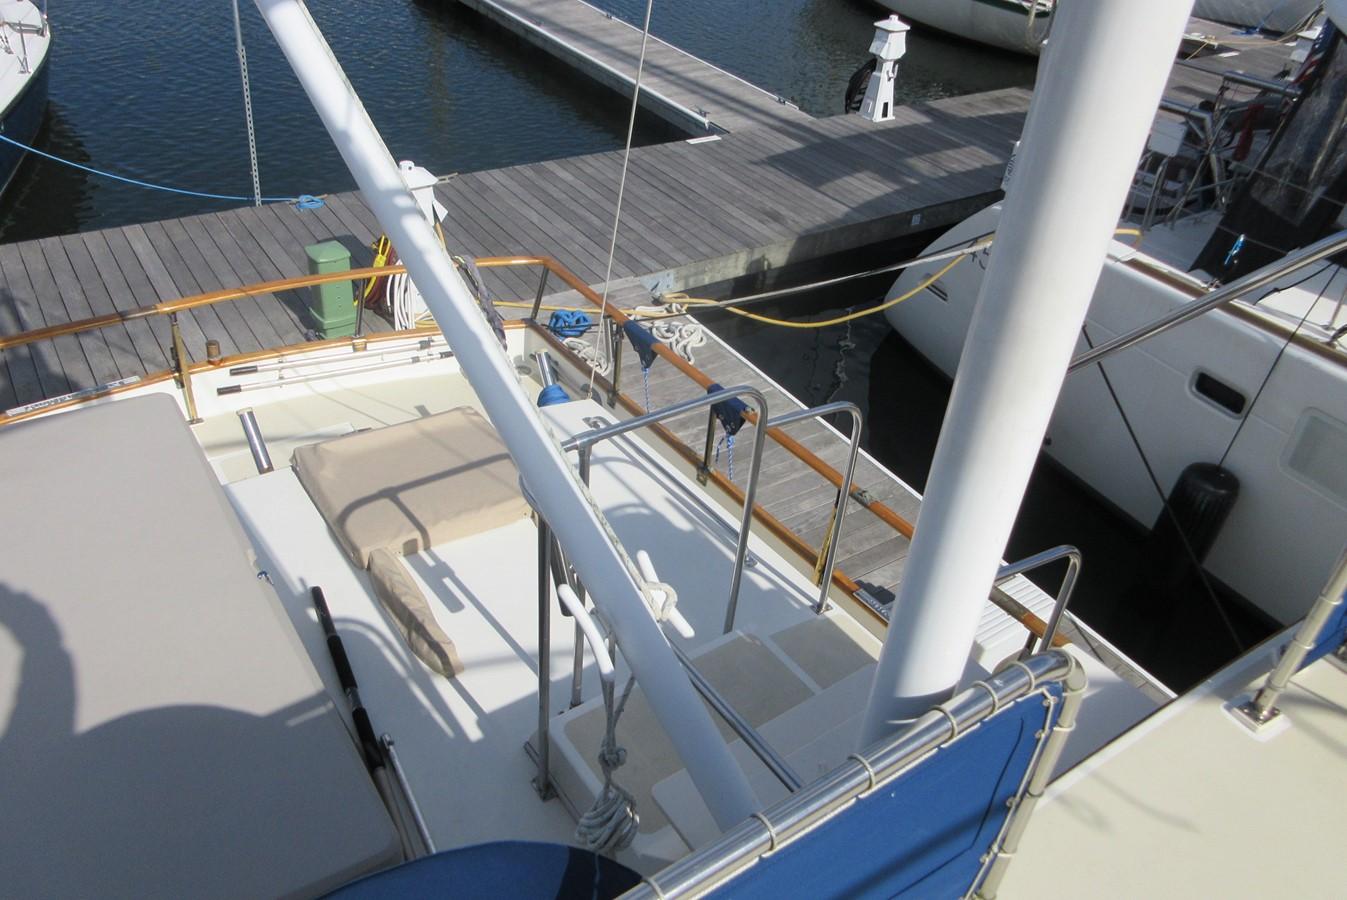 Bridge Deck to Aft Deck, port side 1980 GRAND BANKS 42 Classic Trawler 2865702